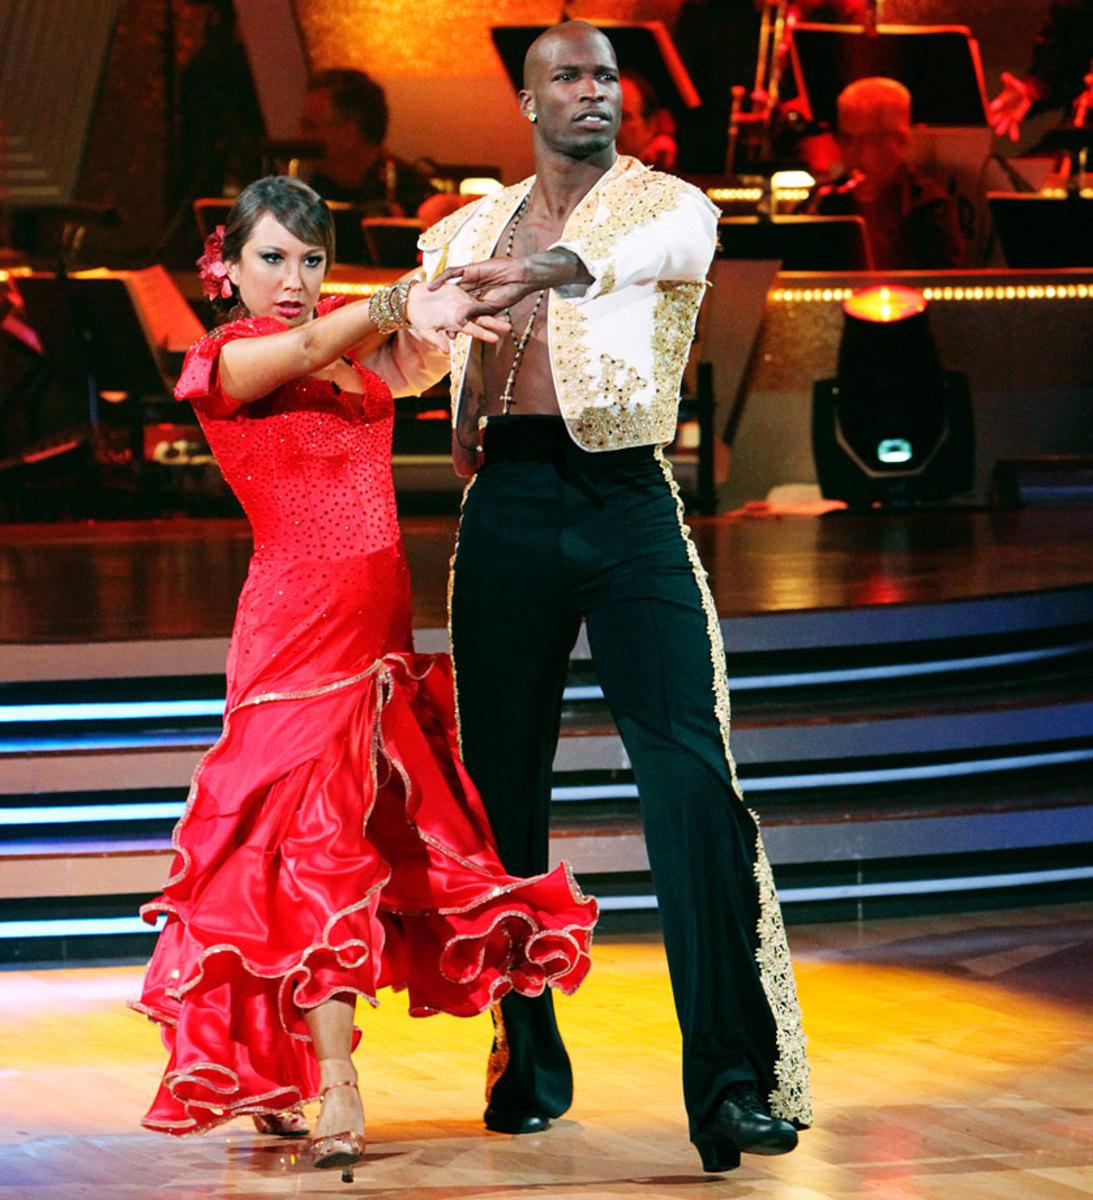 chad-ochocinco-cheryl-burke-dancing-with-the-stars.jpg